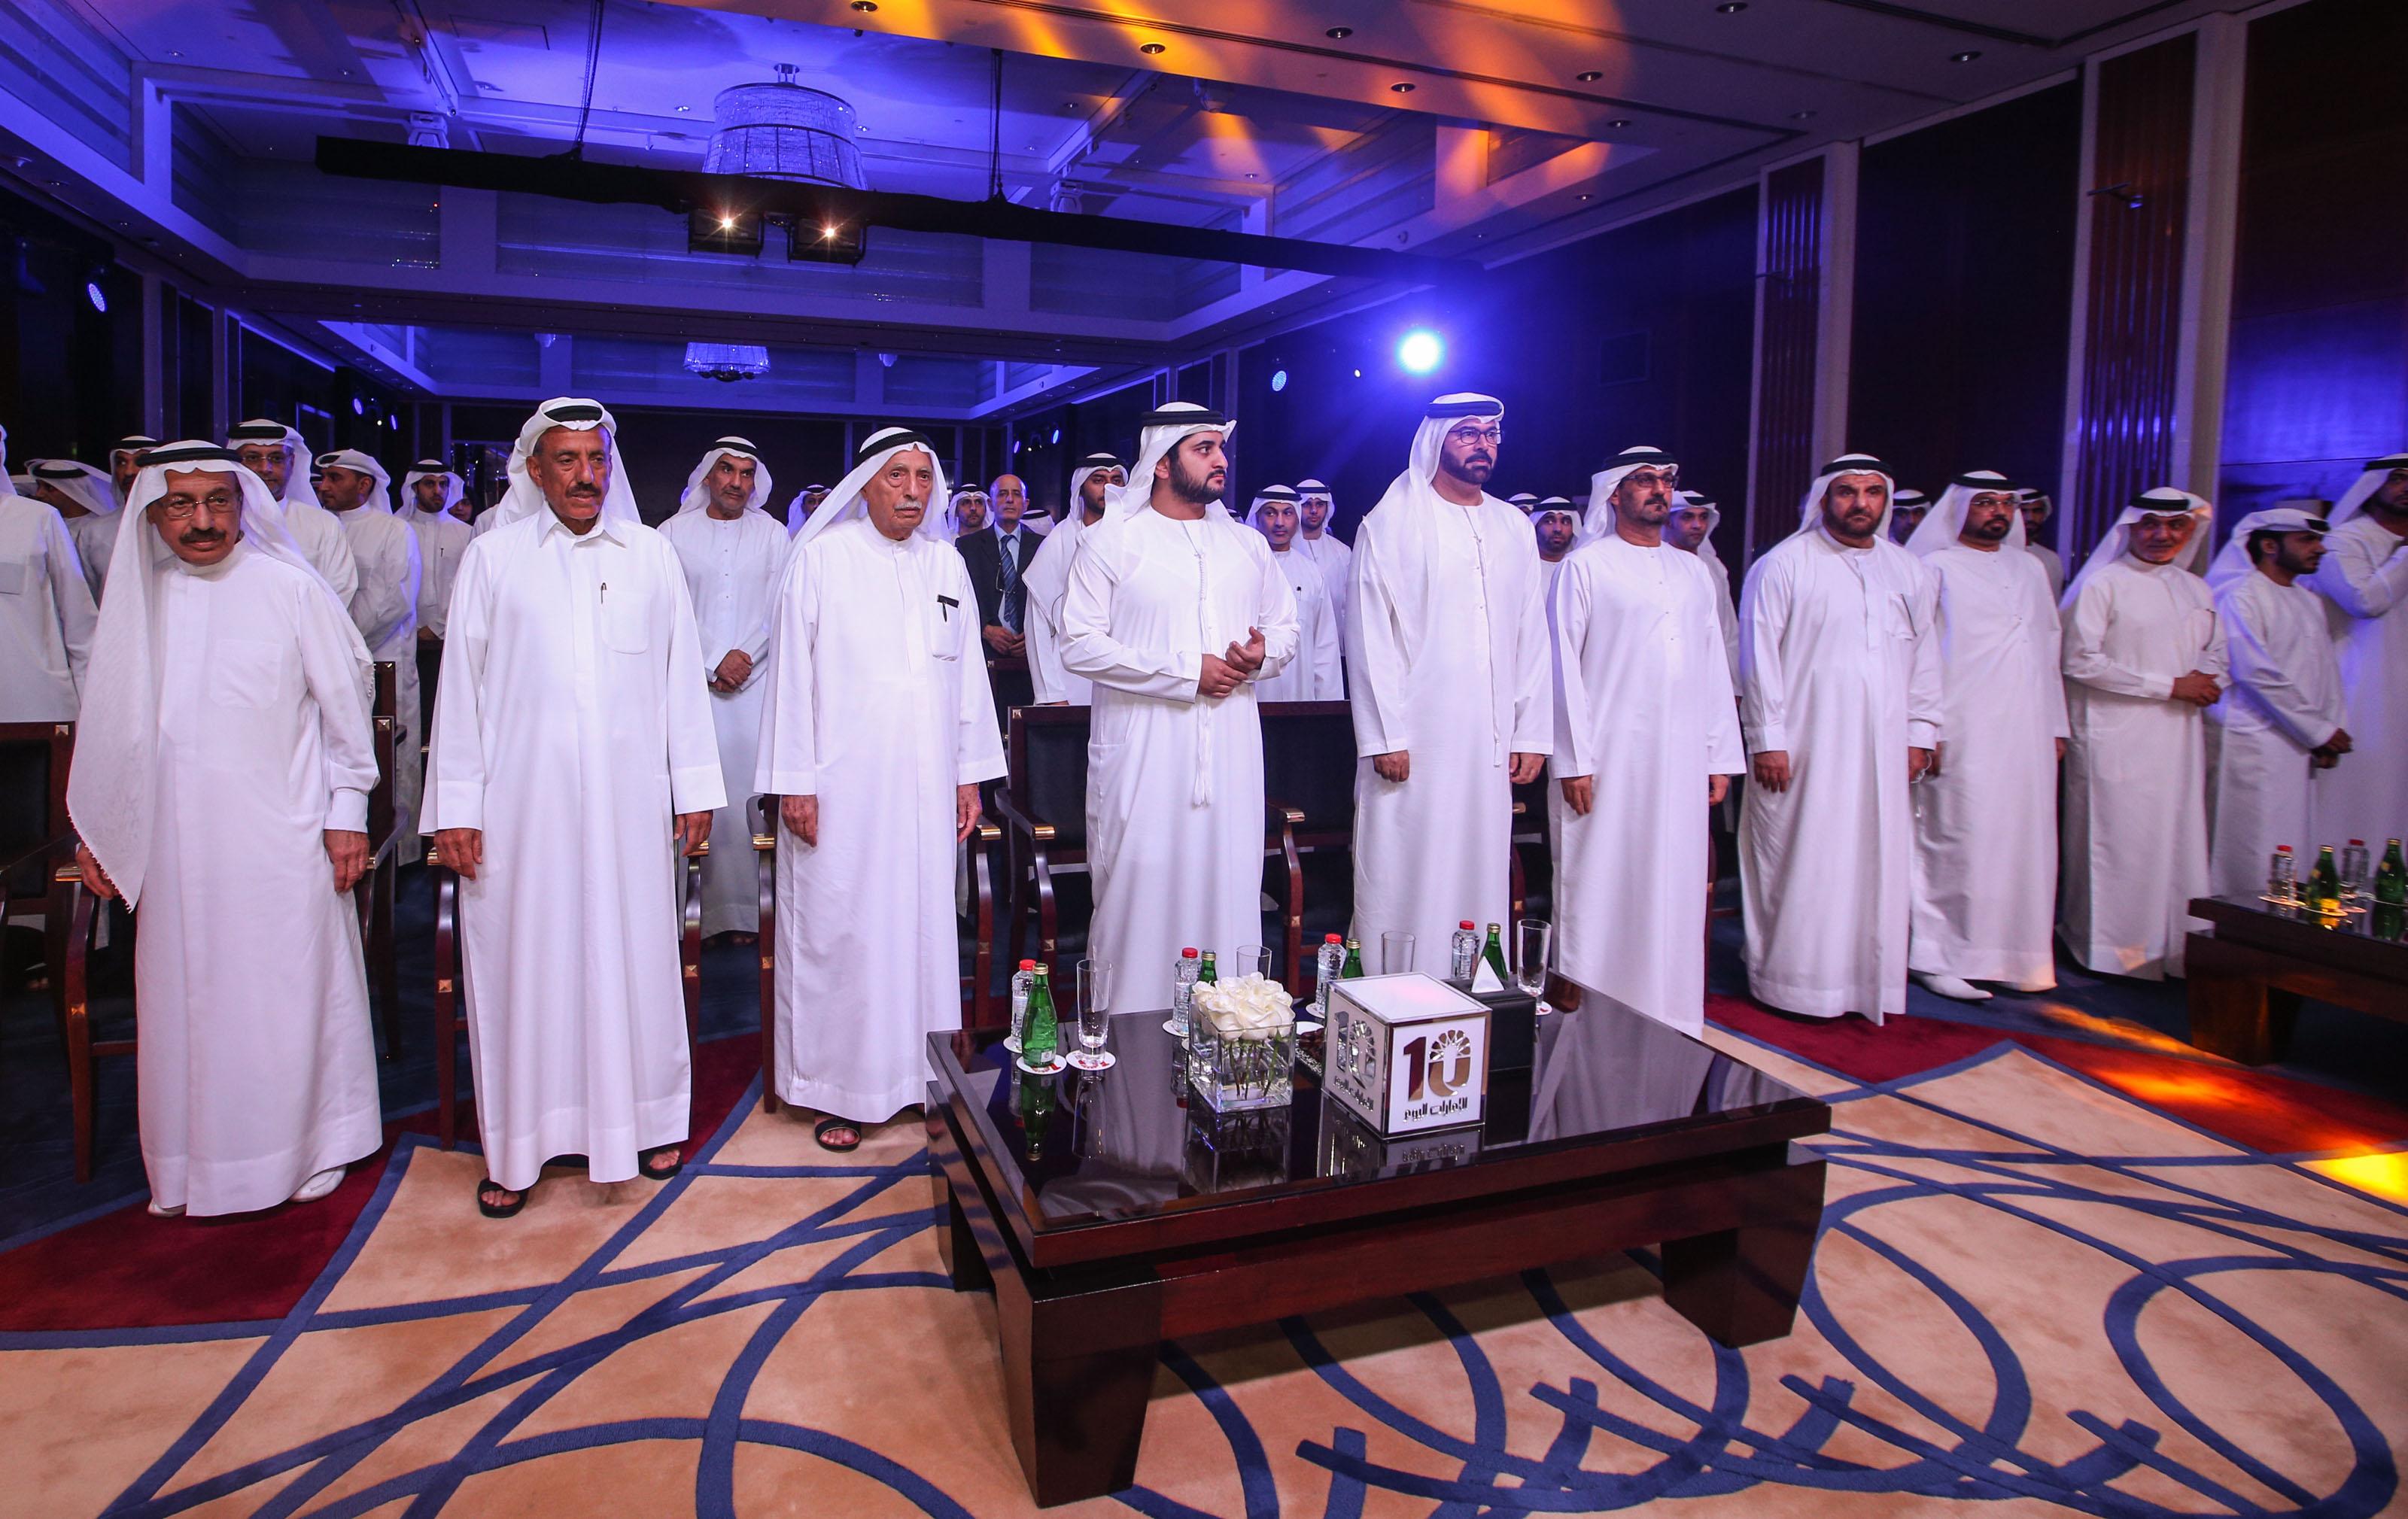 Emarat al youm celebrates its 10th annaversary Dubai. 14 September 2015. Photo by Ashok Verma